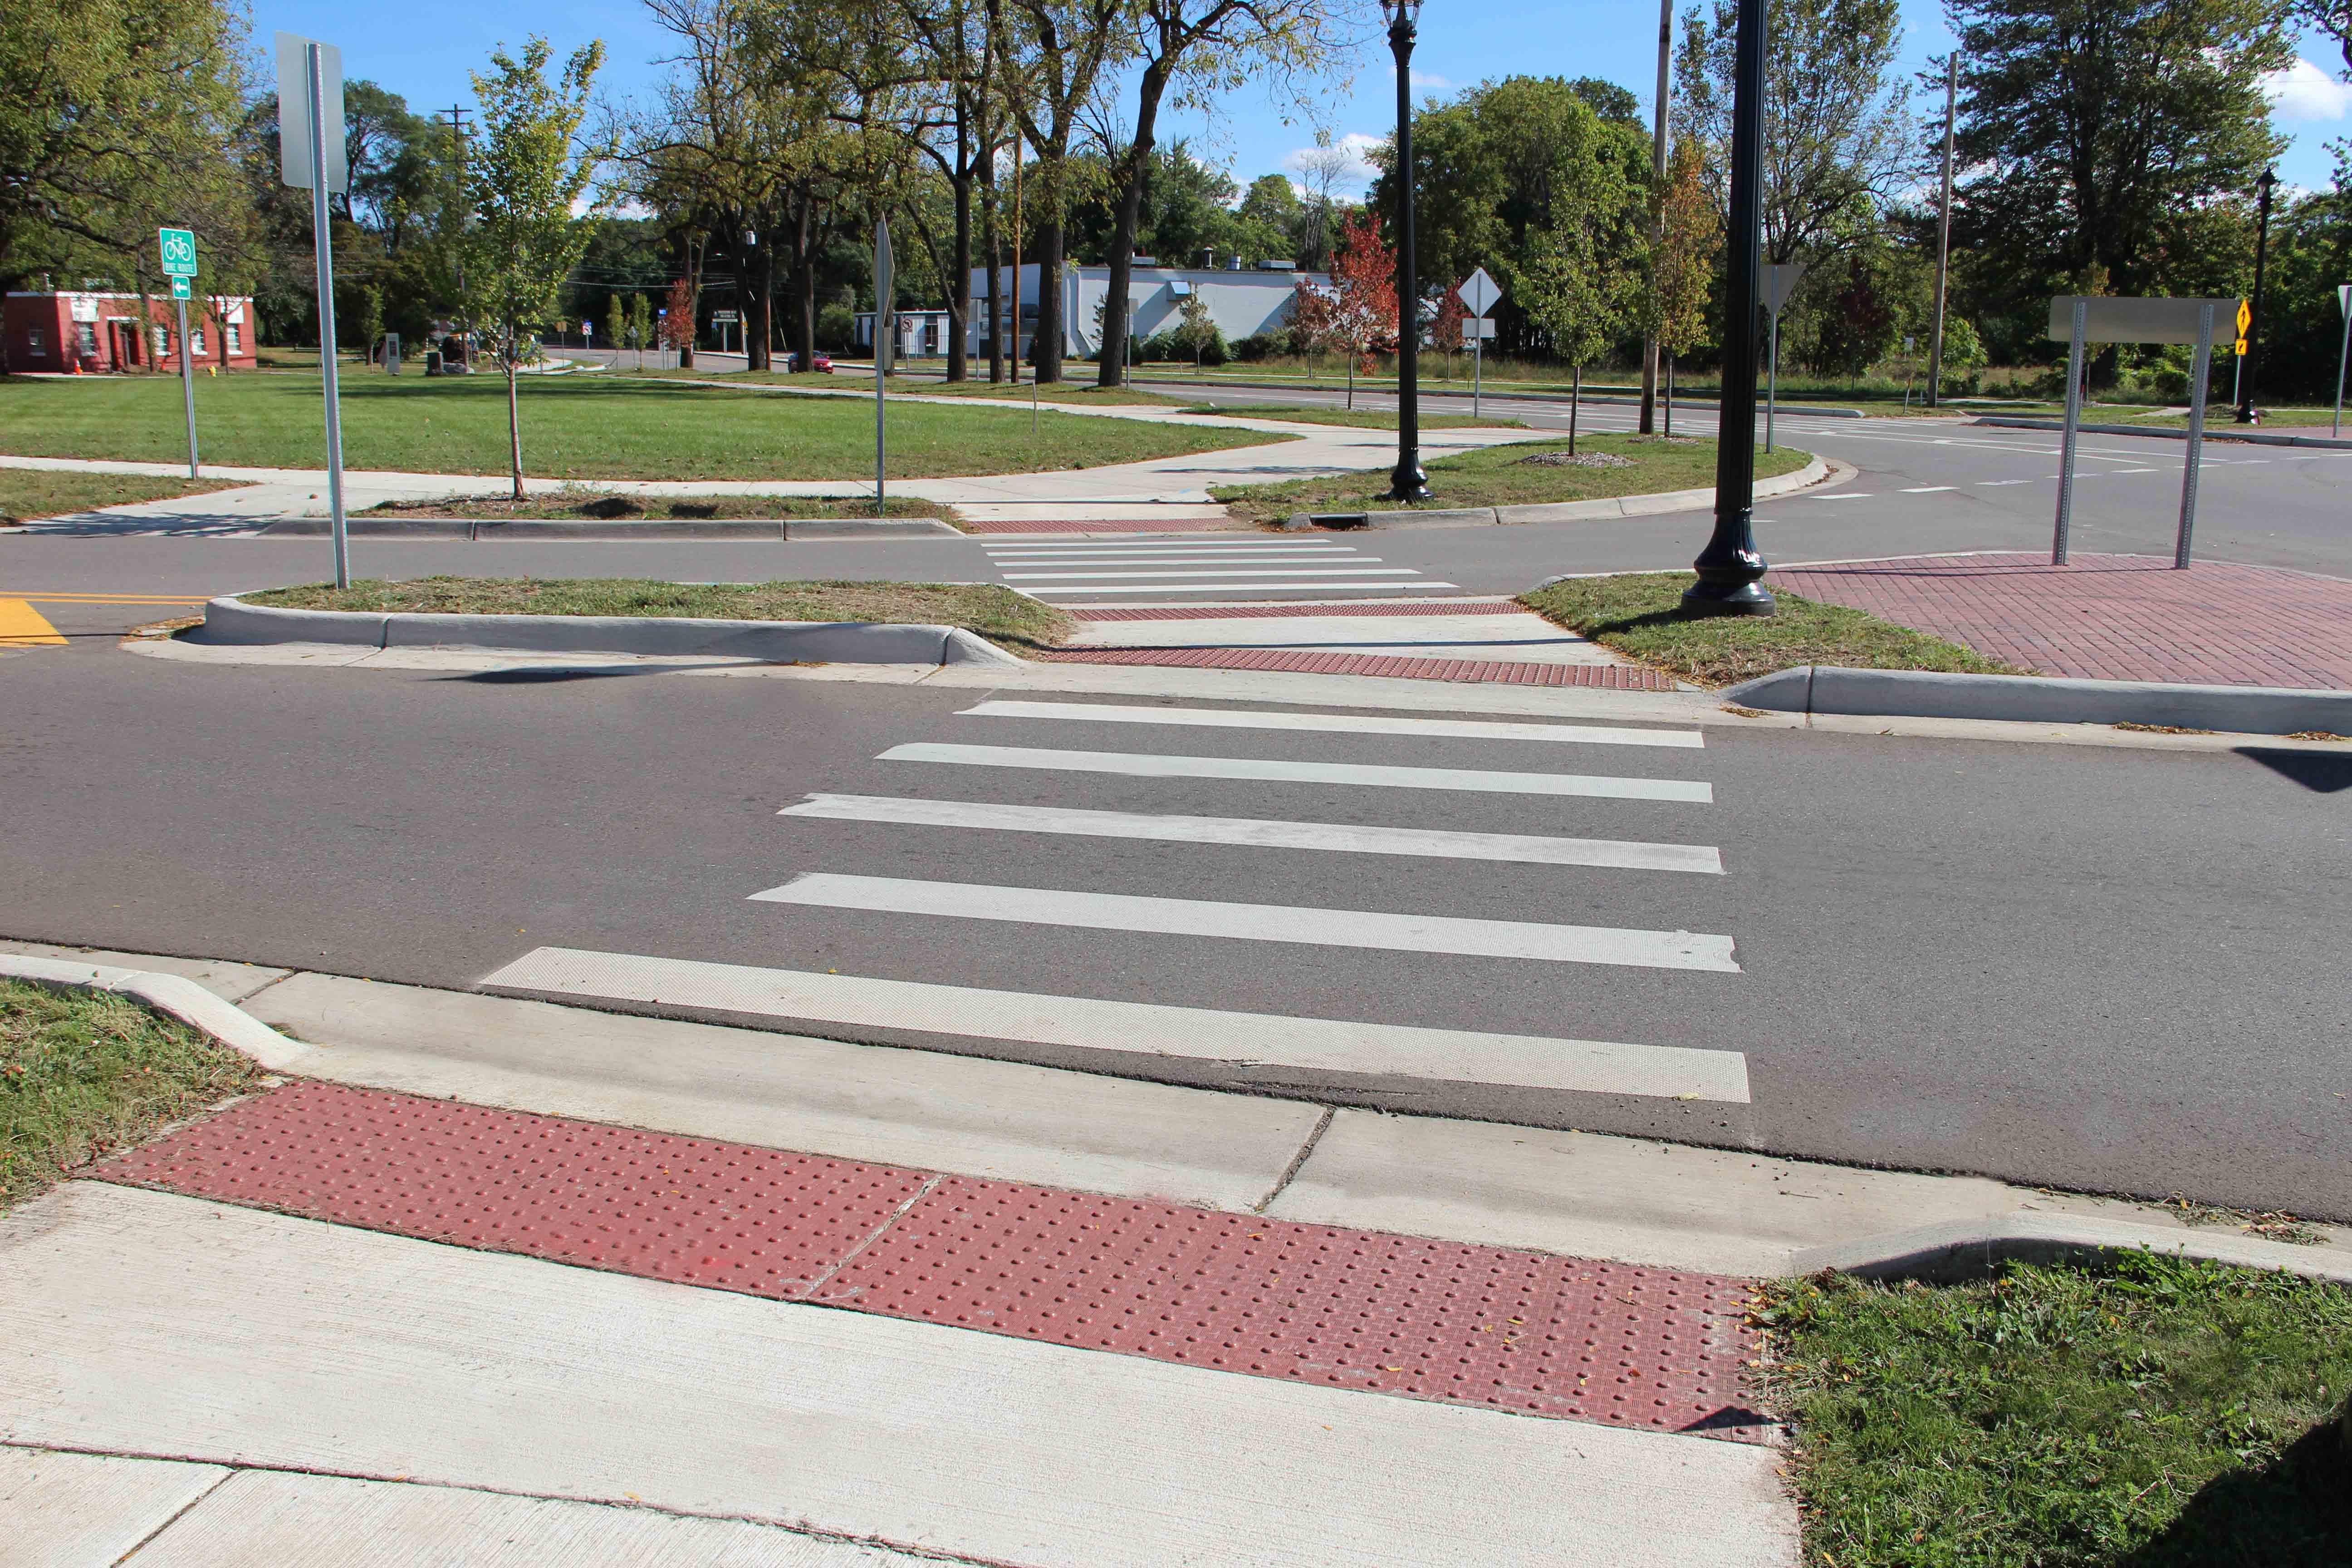 Kalamazoo Roundabout two lanes sidewalk pedestrian crossing view